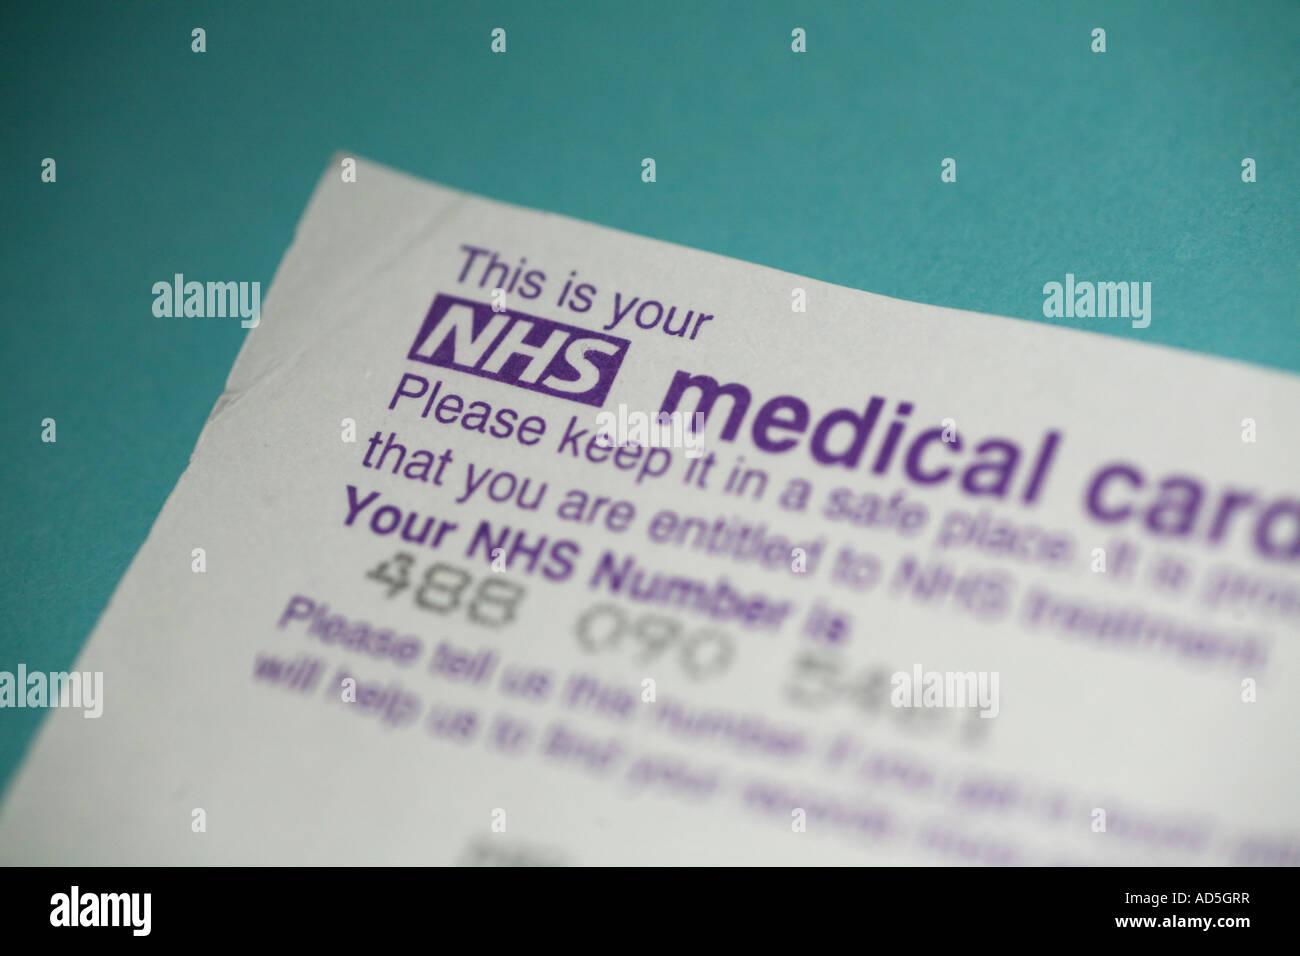 NHS medical card - Stock Image